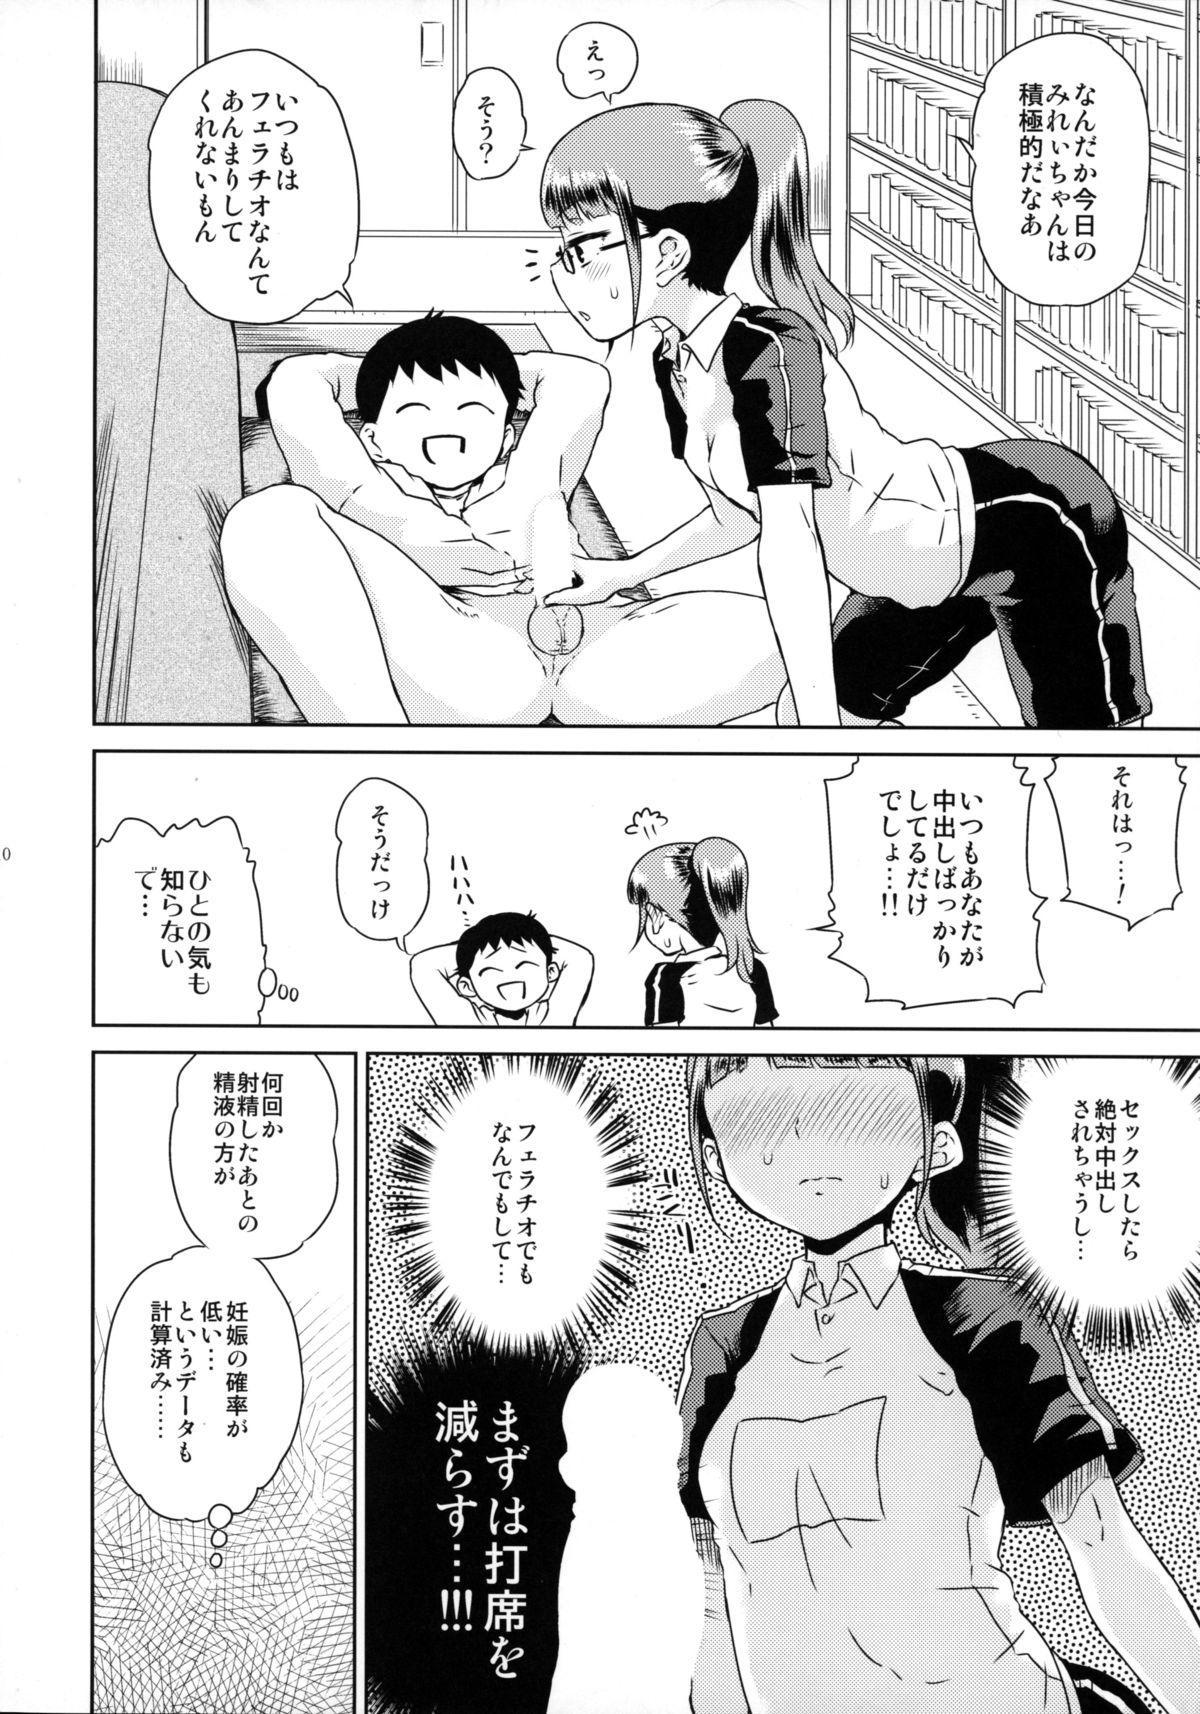 Mirei-chan to Love Love 2 10